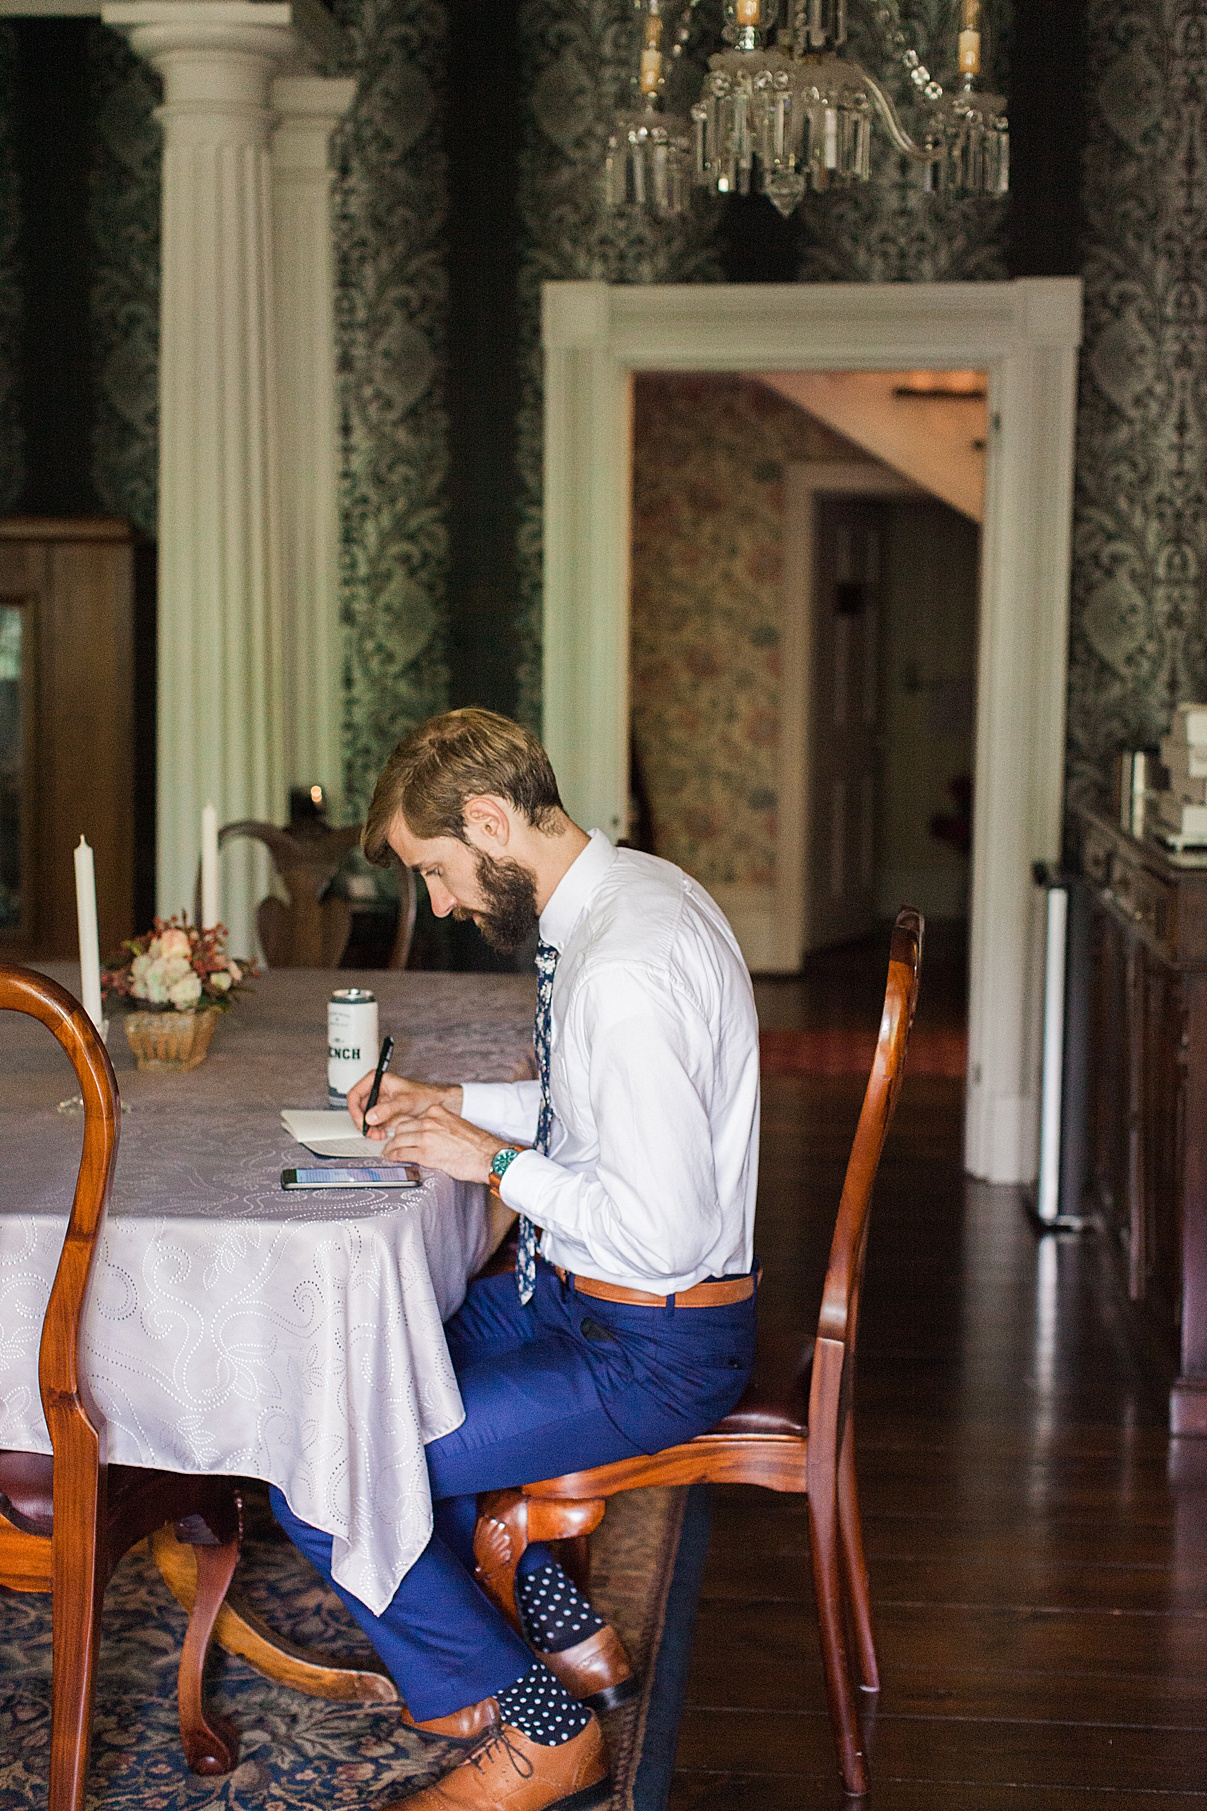 Groom sitting and writing vows at table | Balls Falls, Ontario Wedding| Ontario Wedding Photographer| Toronto Wedding Photographer| 3Photography|3photography.ca